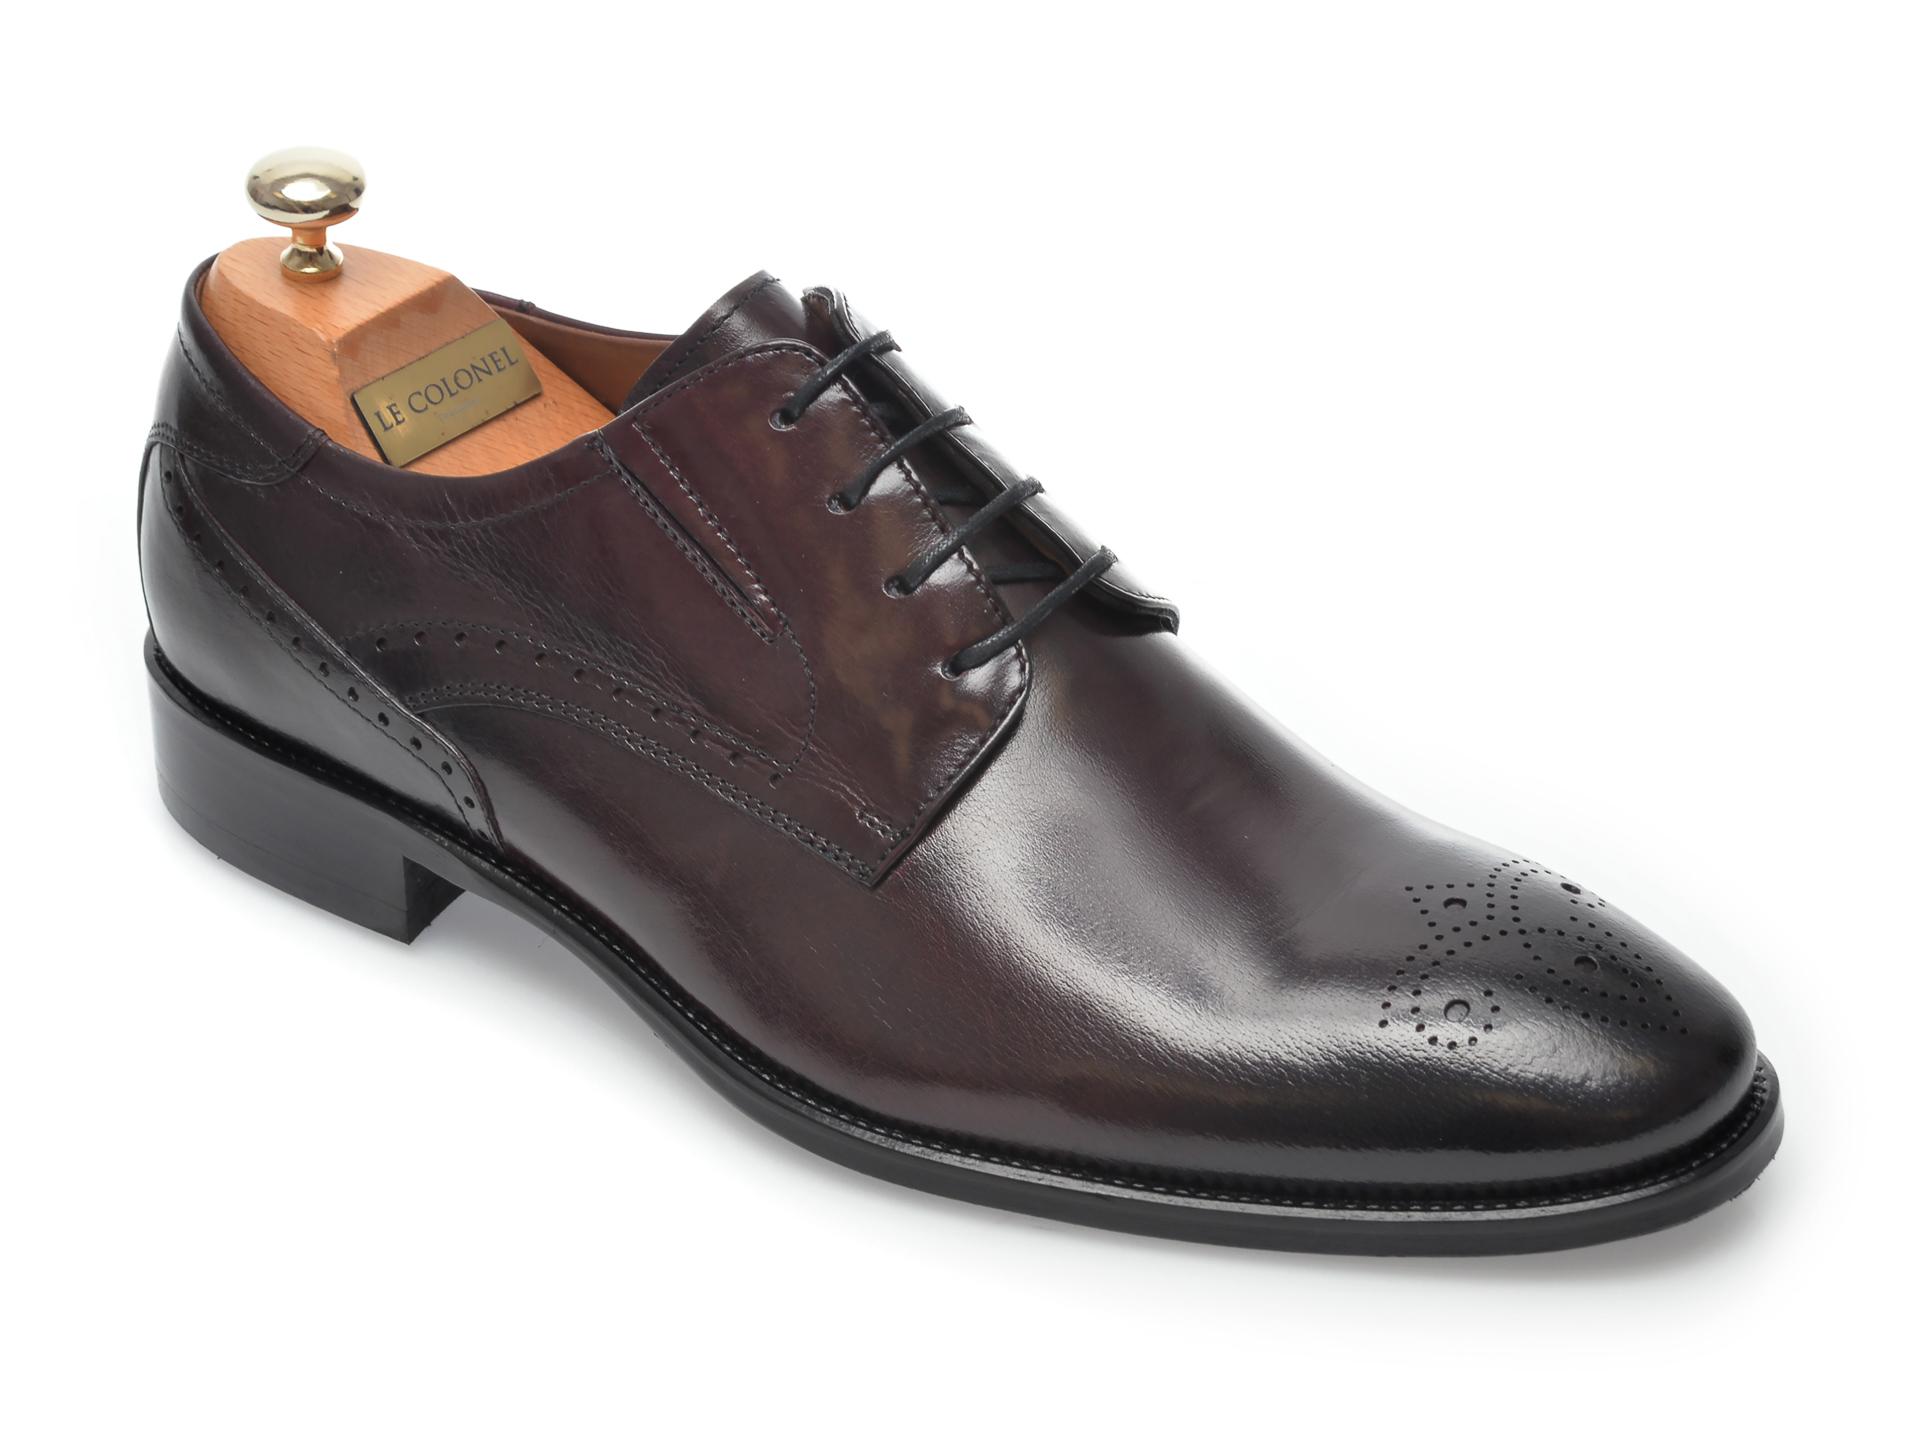 Pantofi LE COLONEL visinii, 33850, din piele naturala imagine